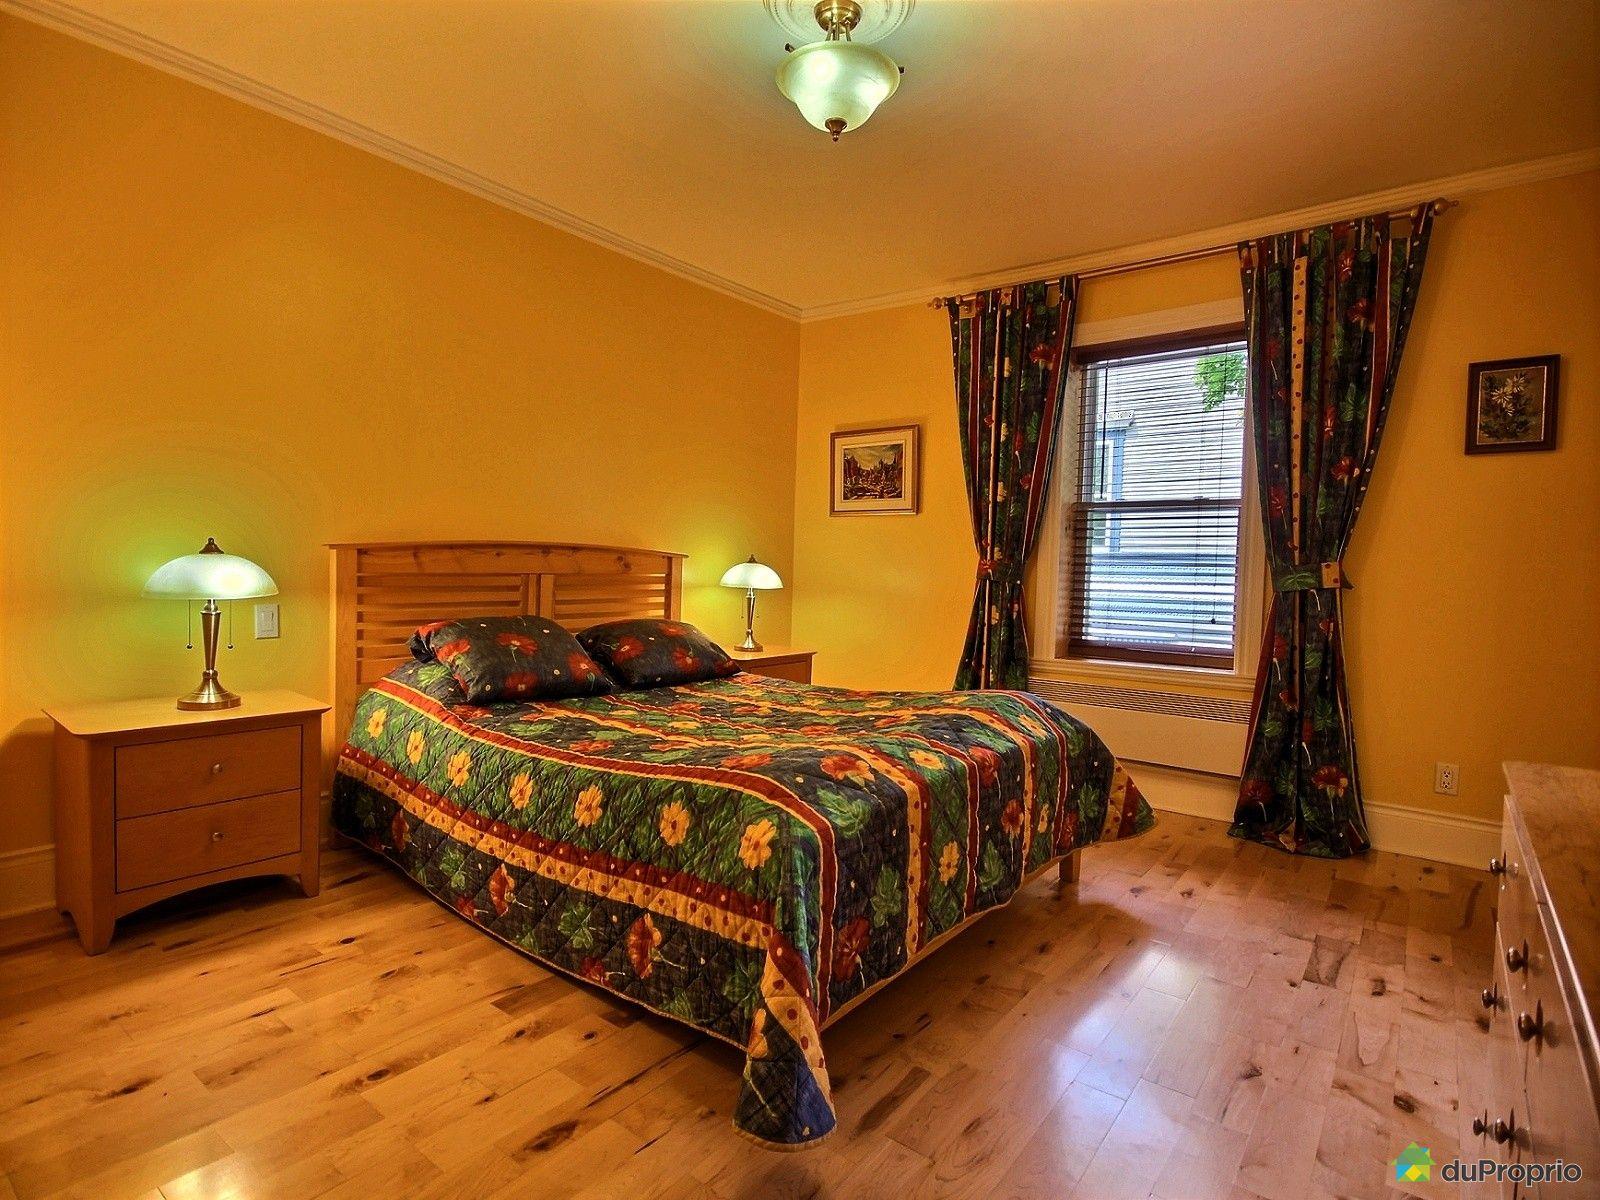 Maison  vendre Sherbrooke 500 rue Moore immobilier Qubec  DuProprio  564919